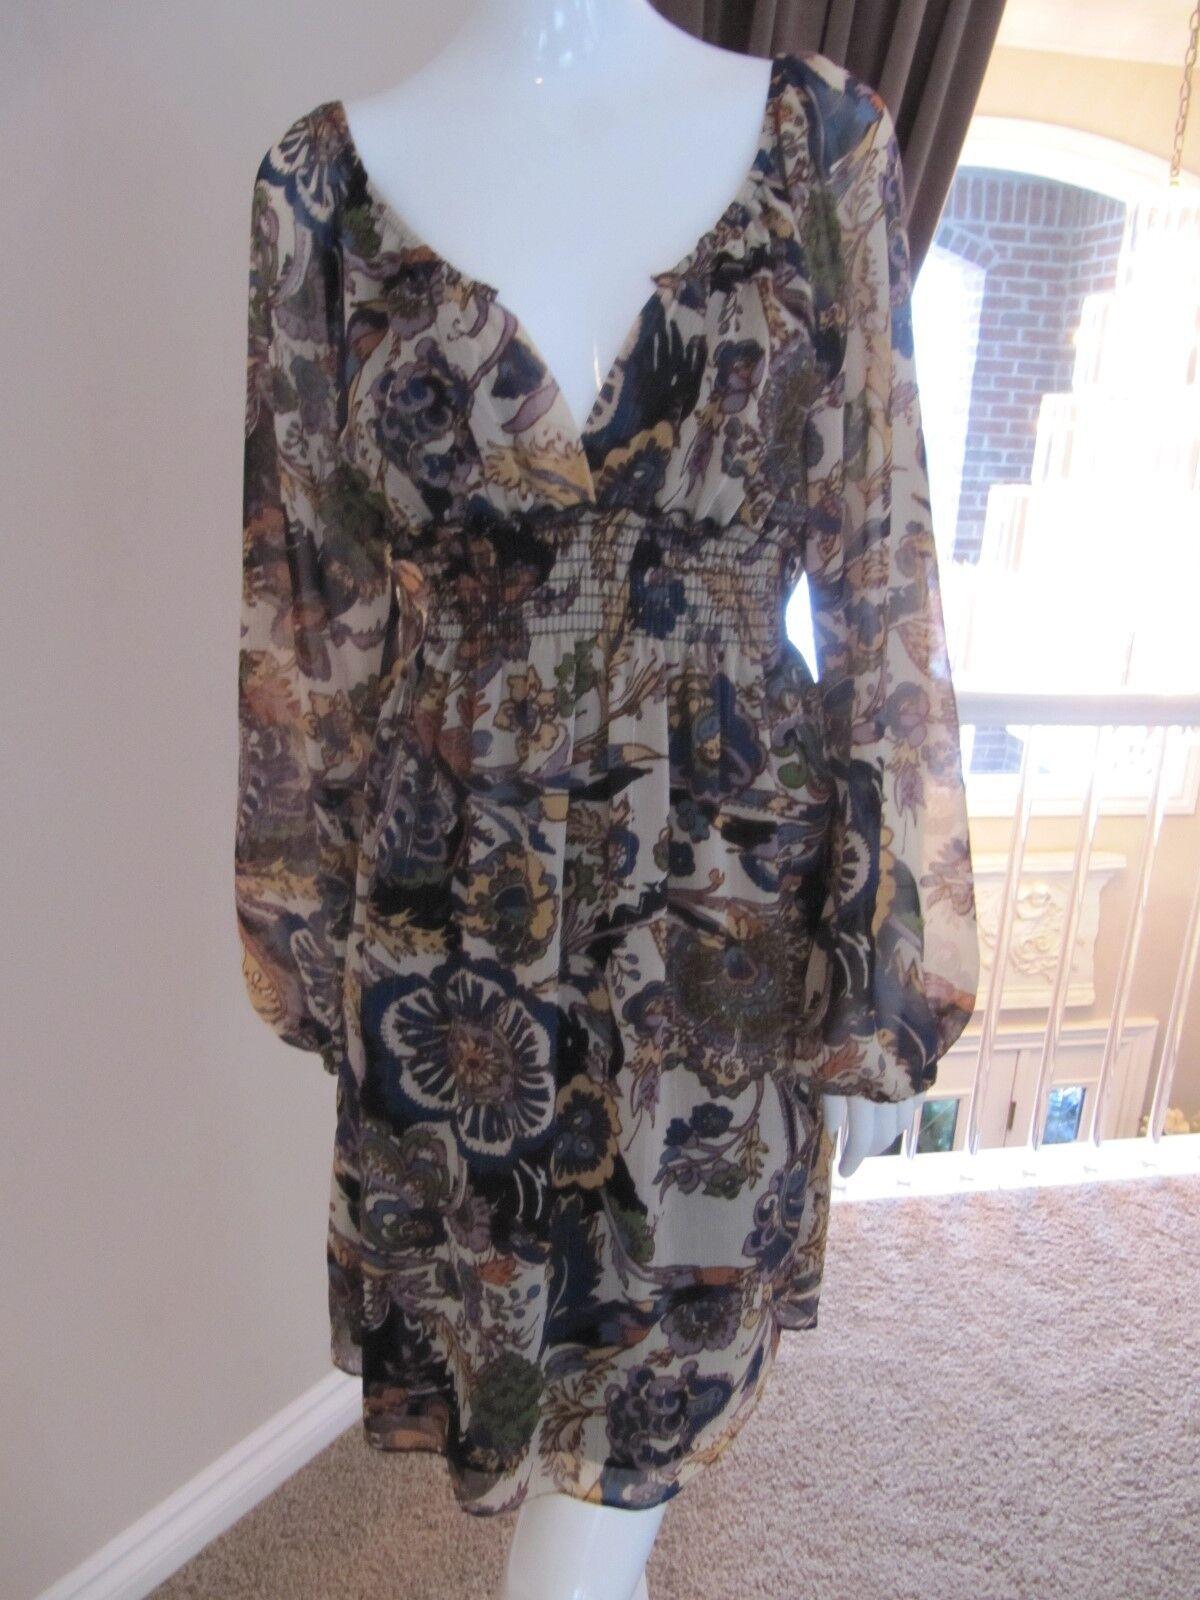 Boston Proper  Floral Paisley Peasant Boho Long Sleeved Dress Size Small  129